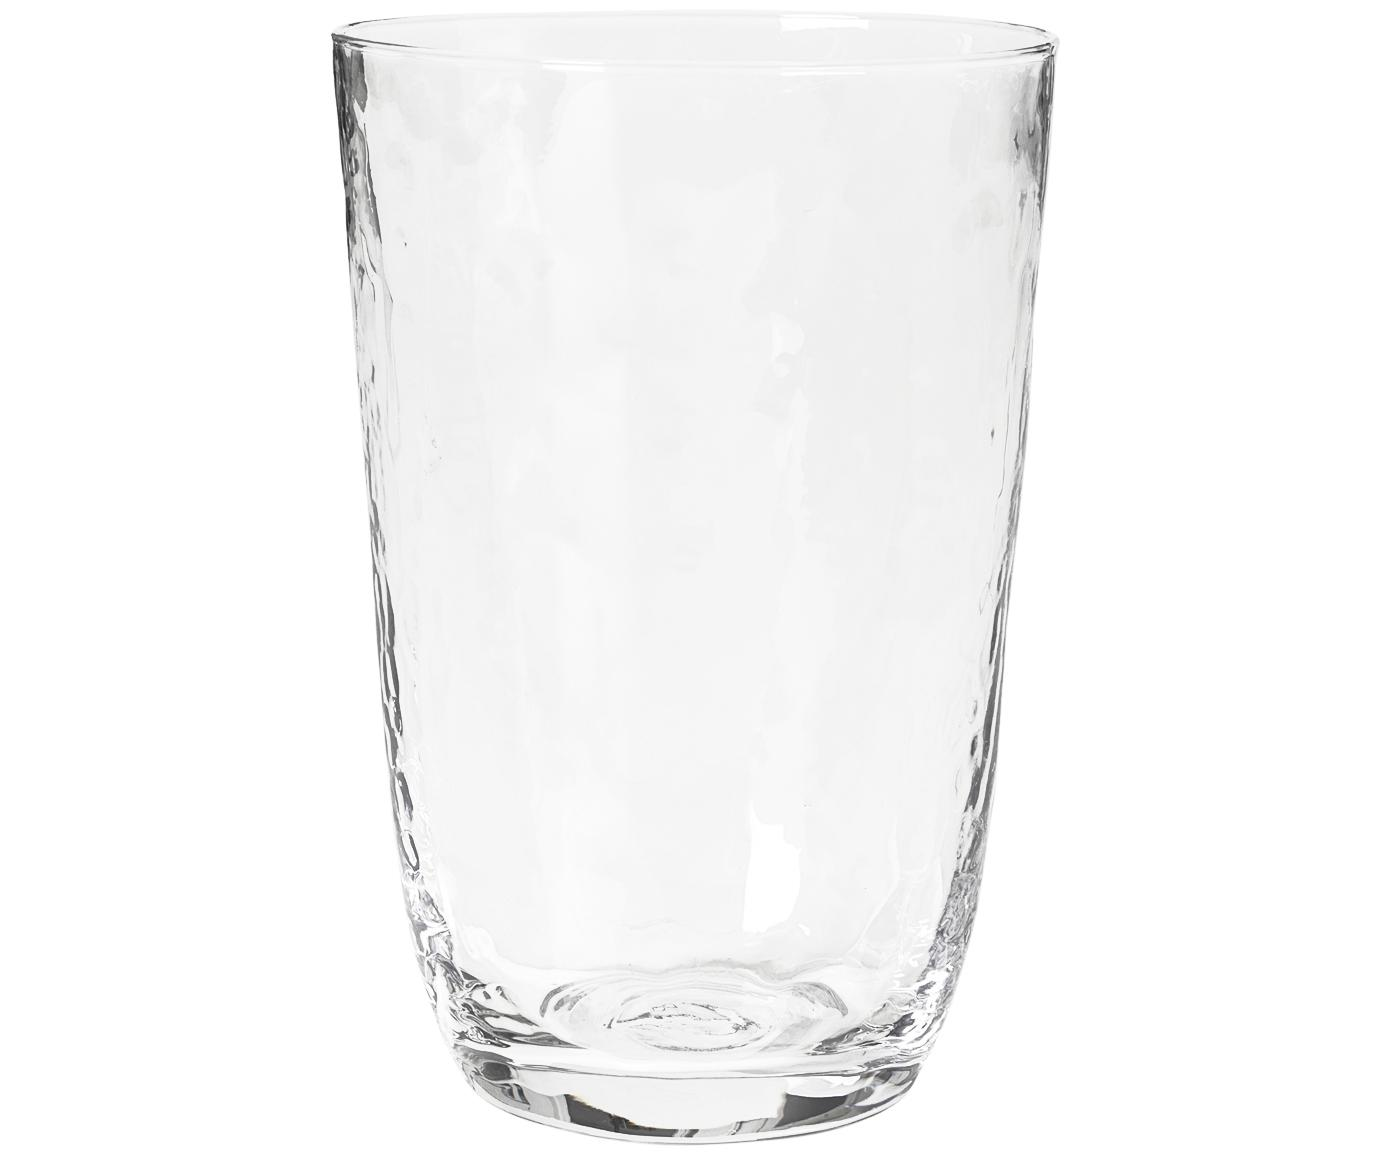 Bicchiere acqua in vetro soffiato Hammered 4 pz, Vetro soffiato, Trasparente, Ø 9 x Alt. 14 cm